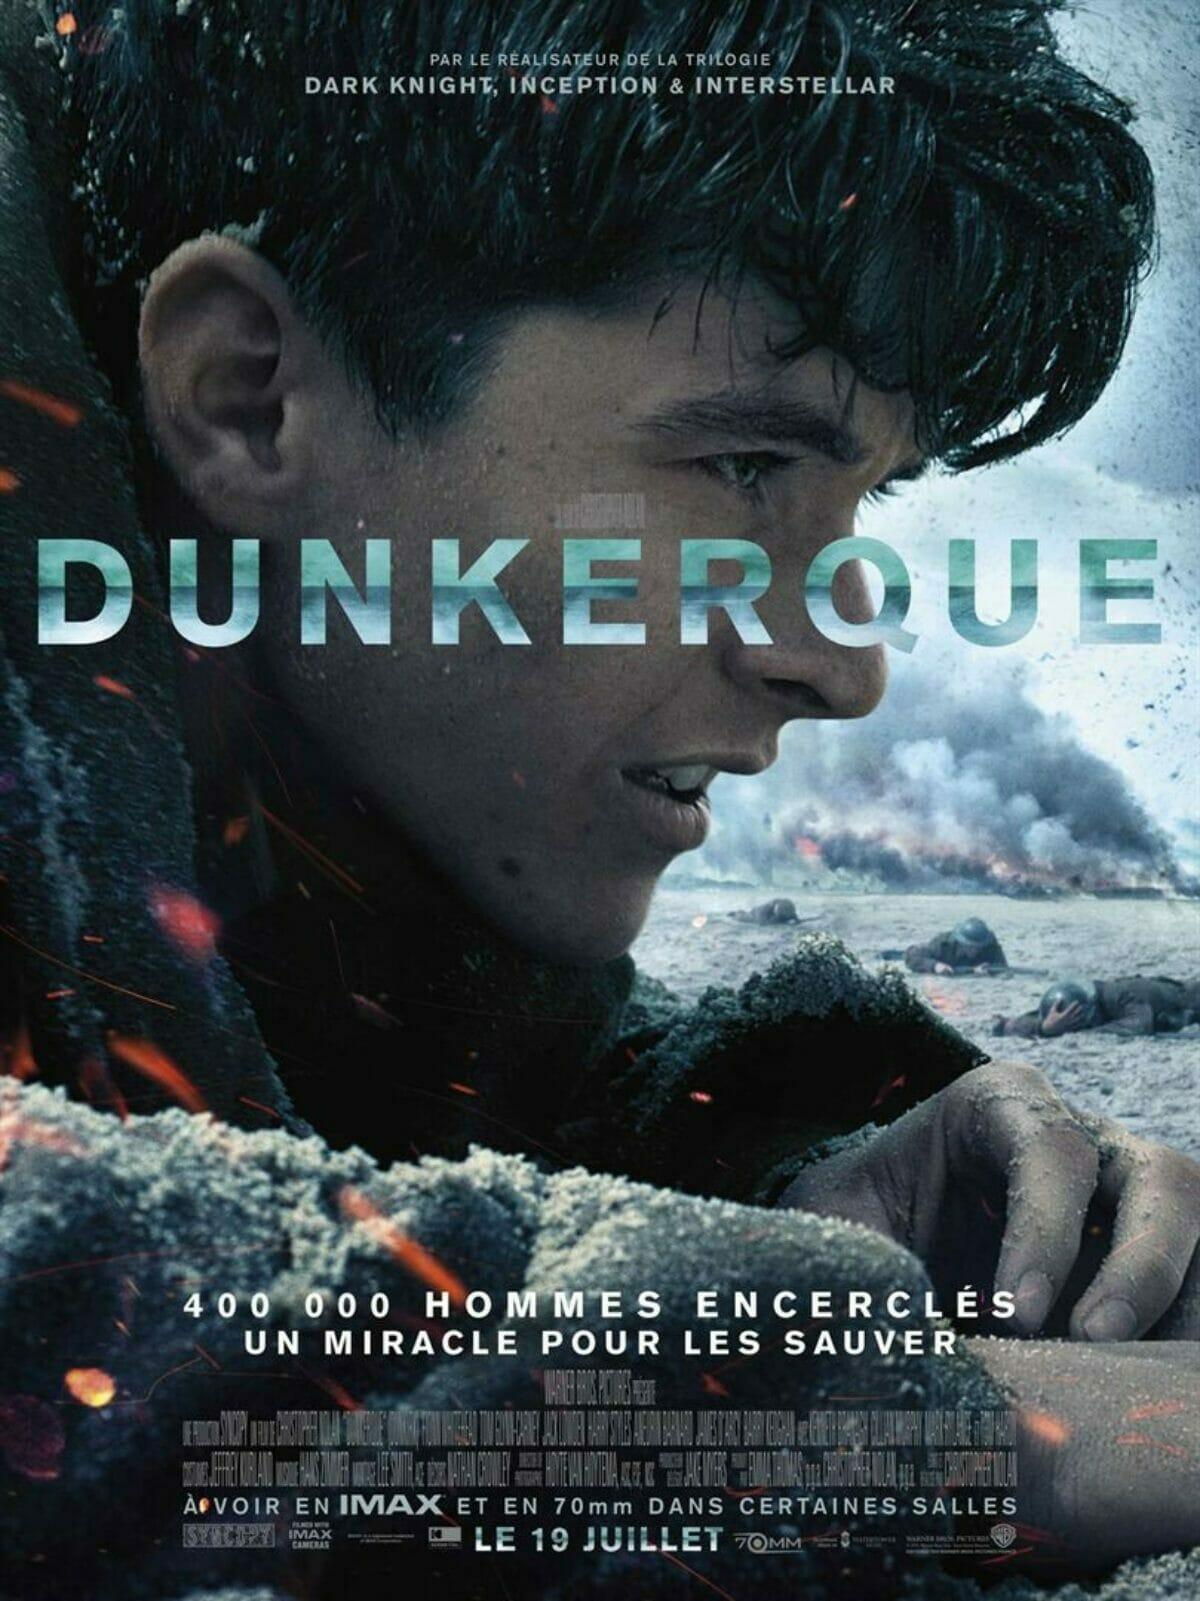 Dunkerque-poster-France